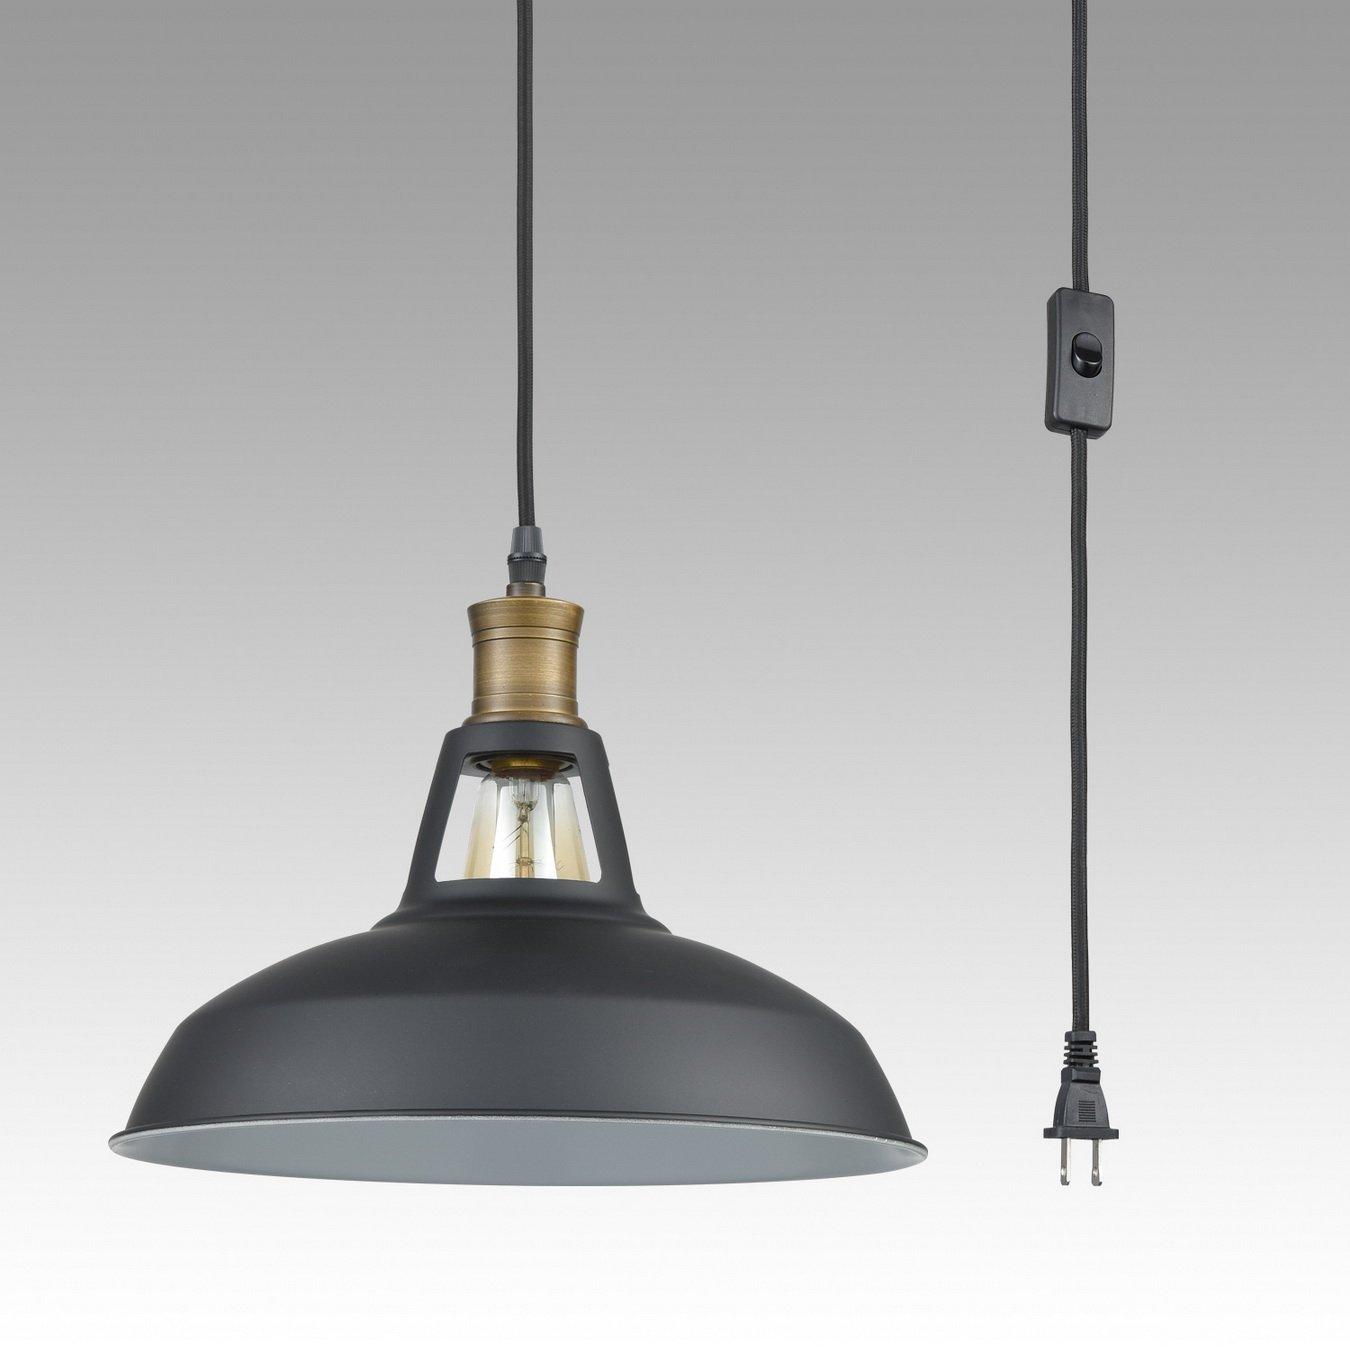 YOBO Lighting Industrial Plug-in Pendant Light With 9.8 Ft